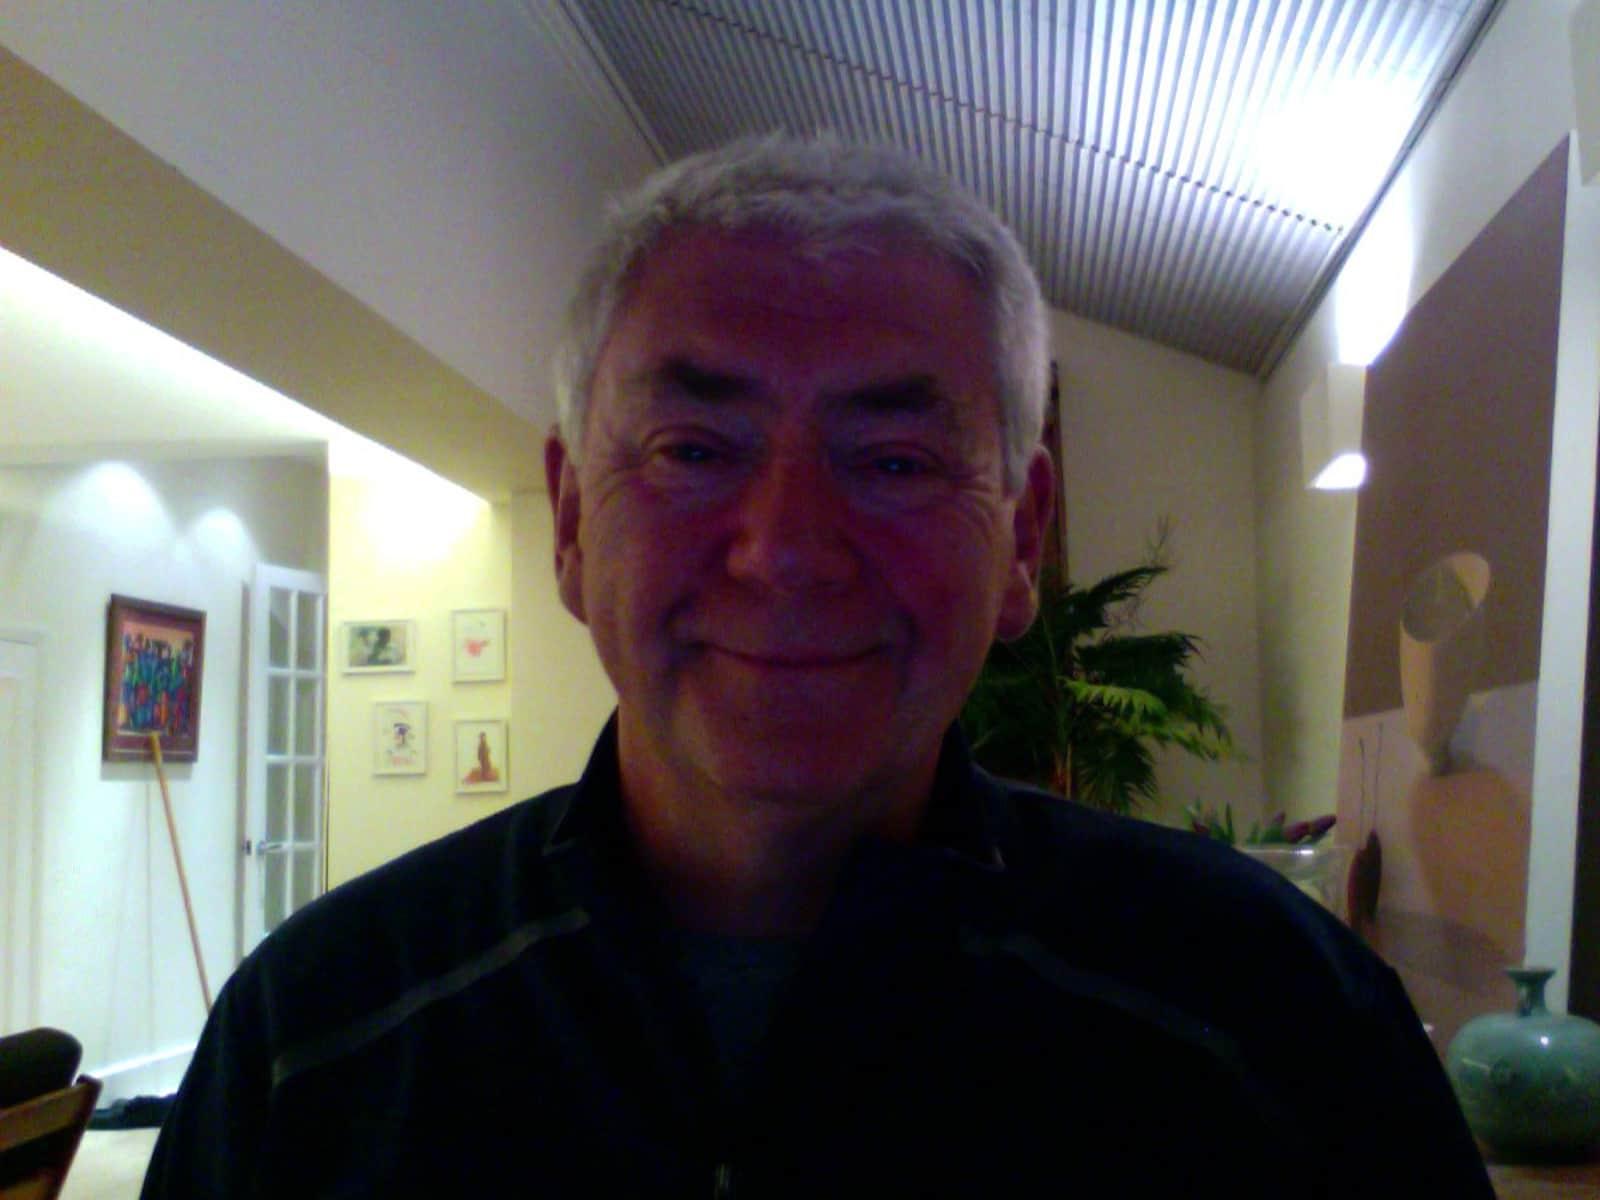 John from London, United Kingdom